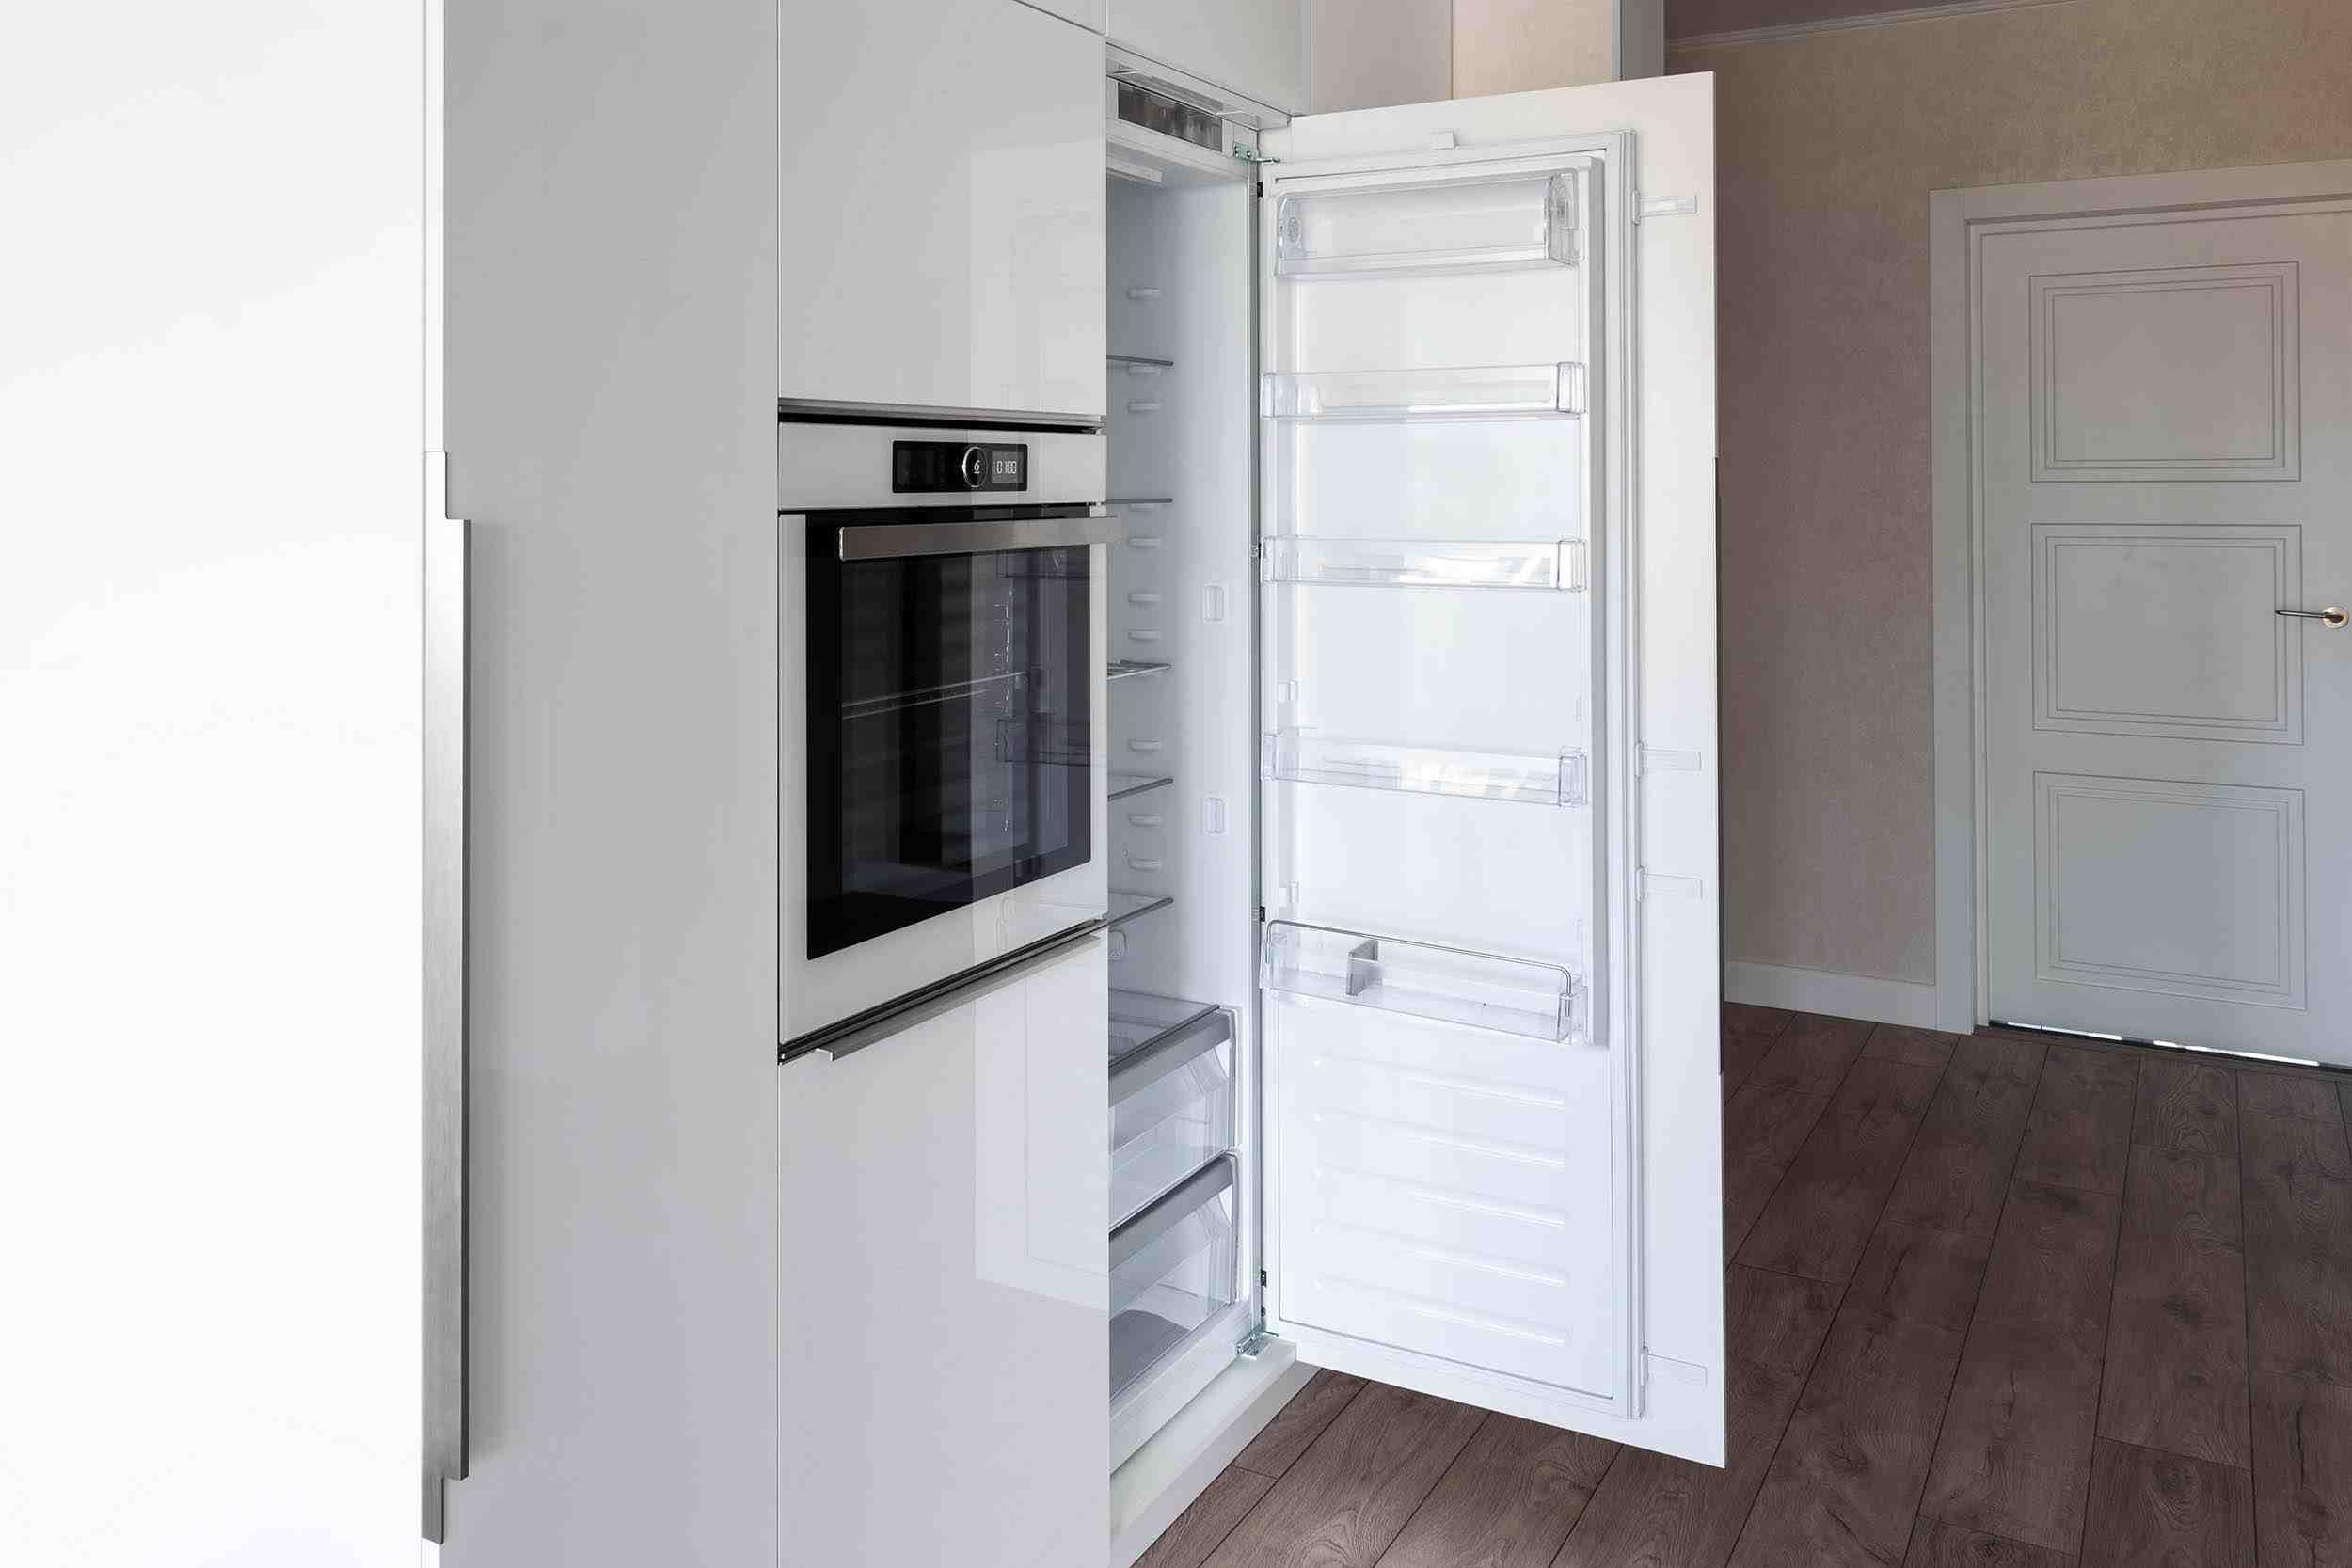 Integrated Fridge | Concealed Appliances | Oasis Kitchen Cabinets